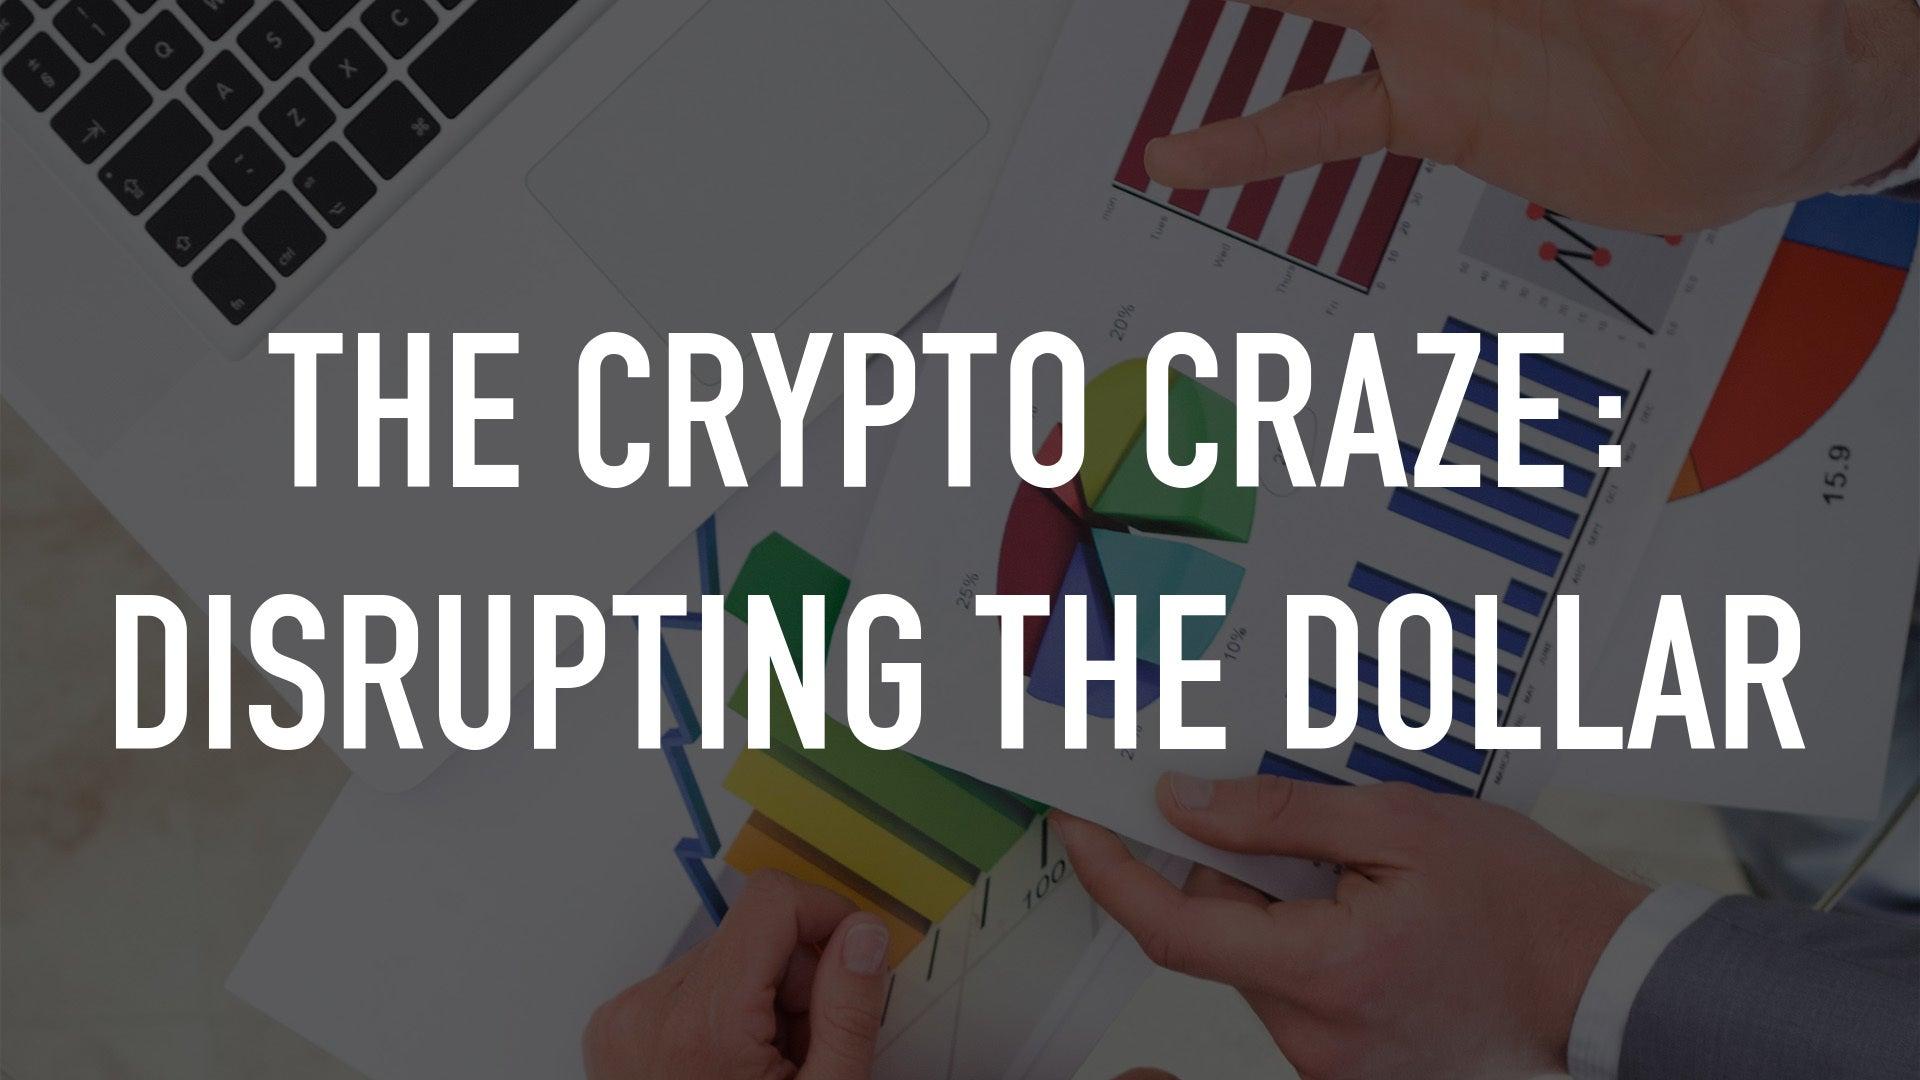 The Crypto Craze: Disrupting the Dollar